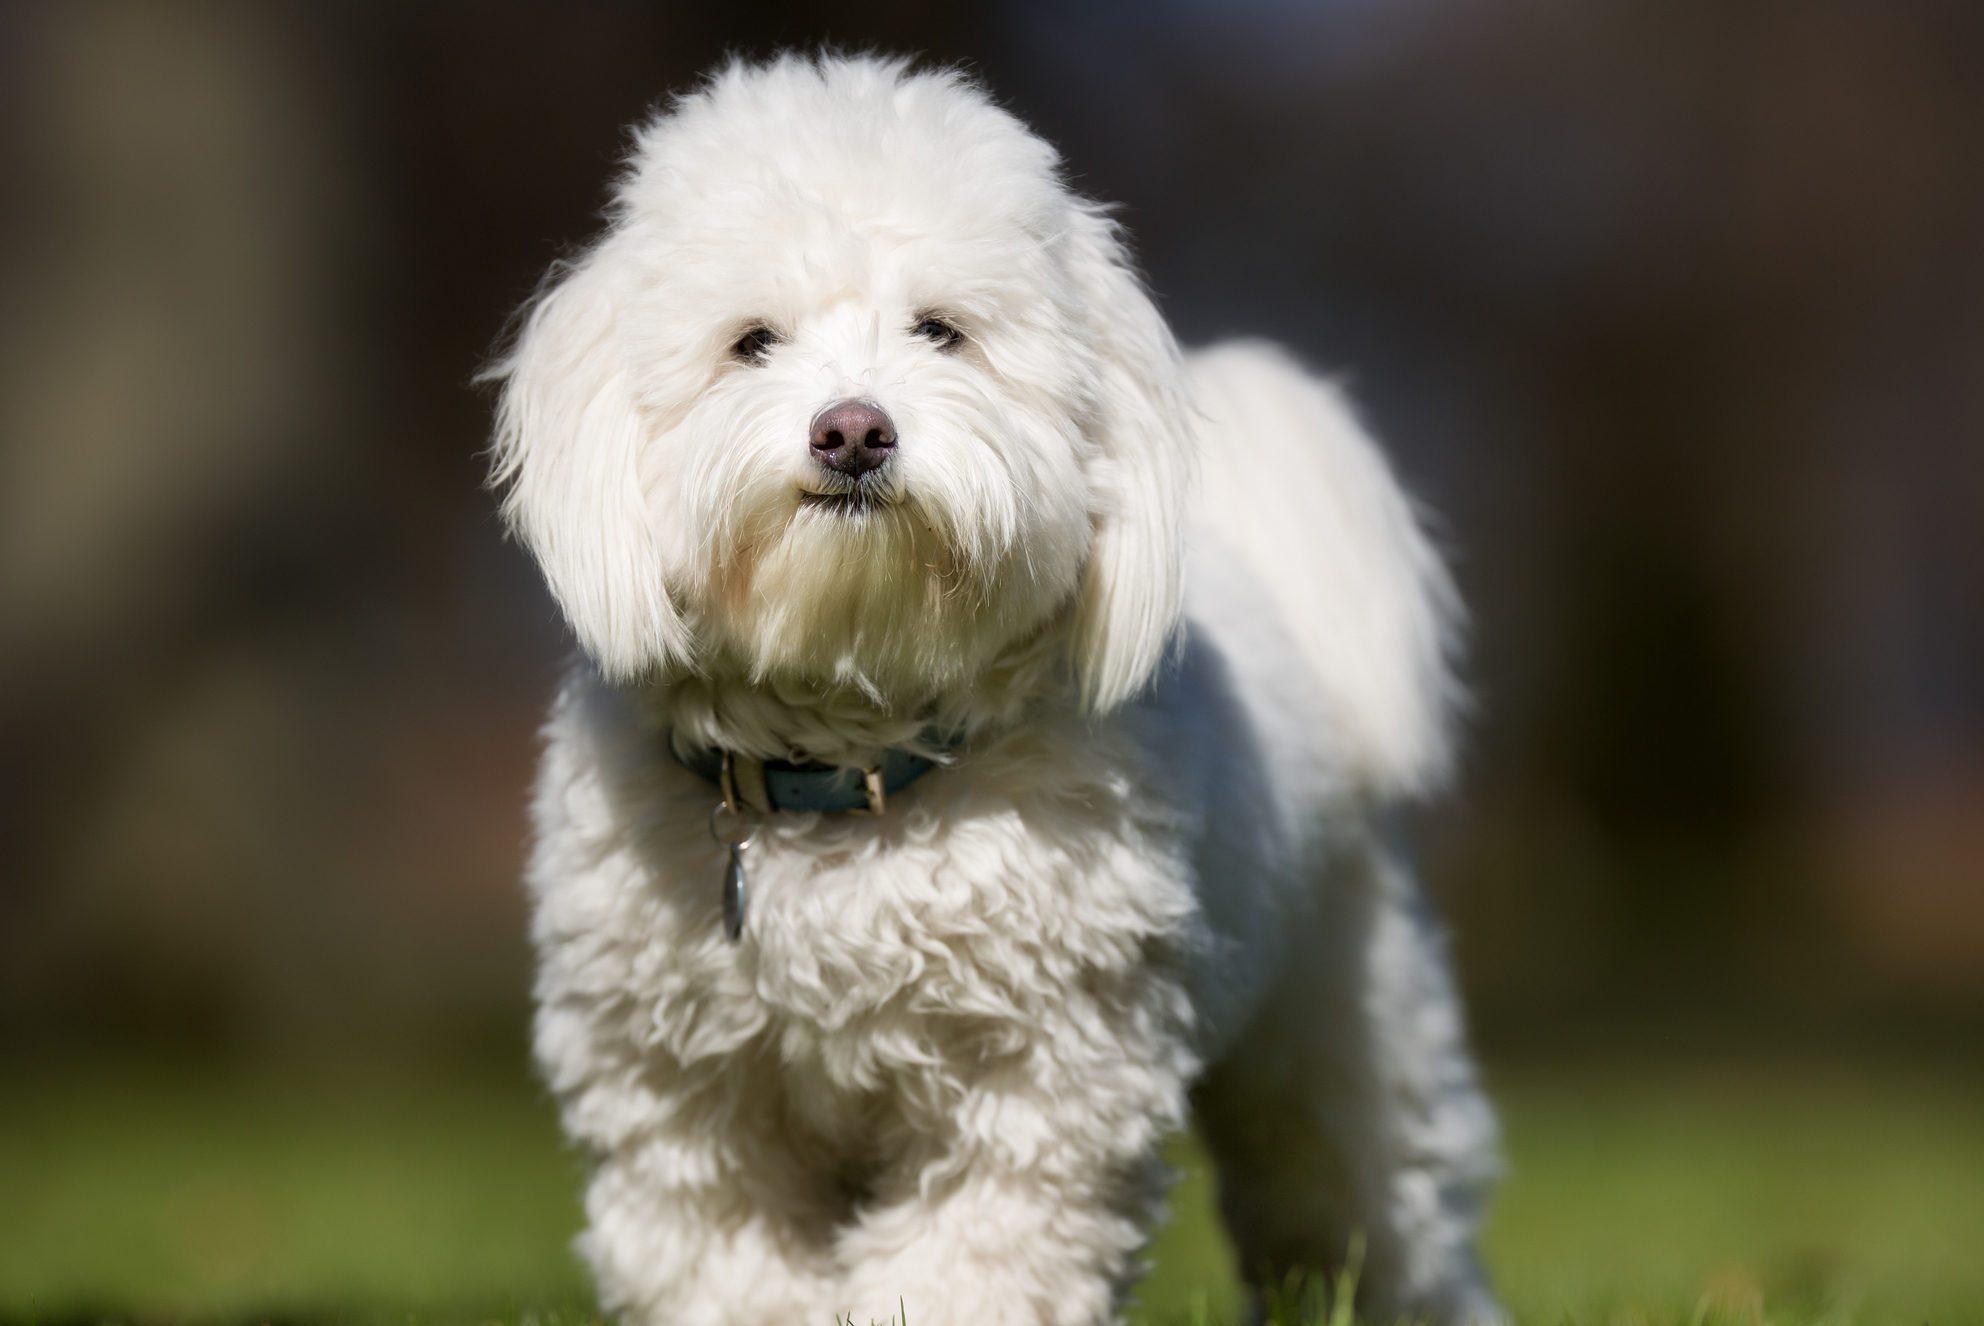 Coton de Tulear dog outdoors in nature